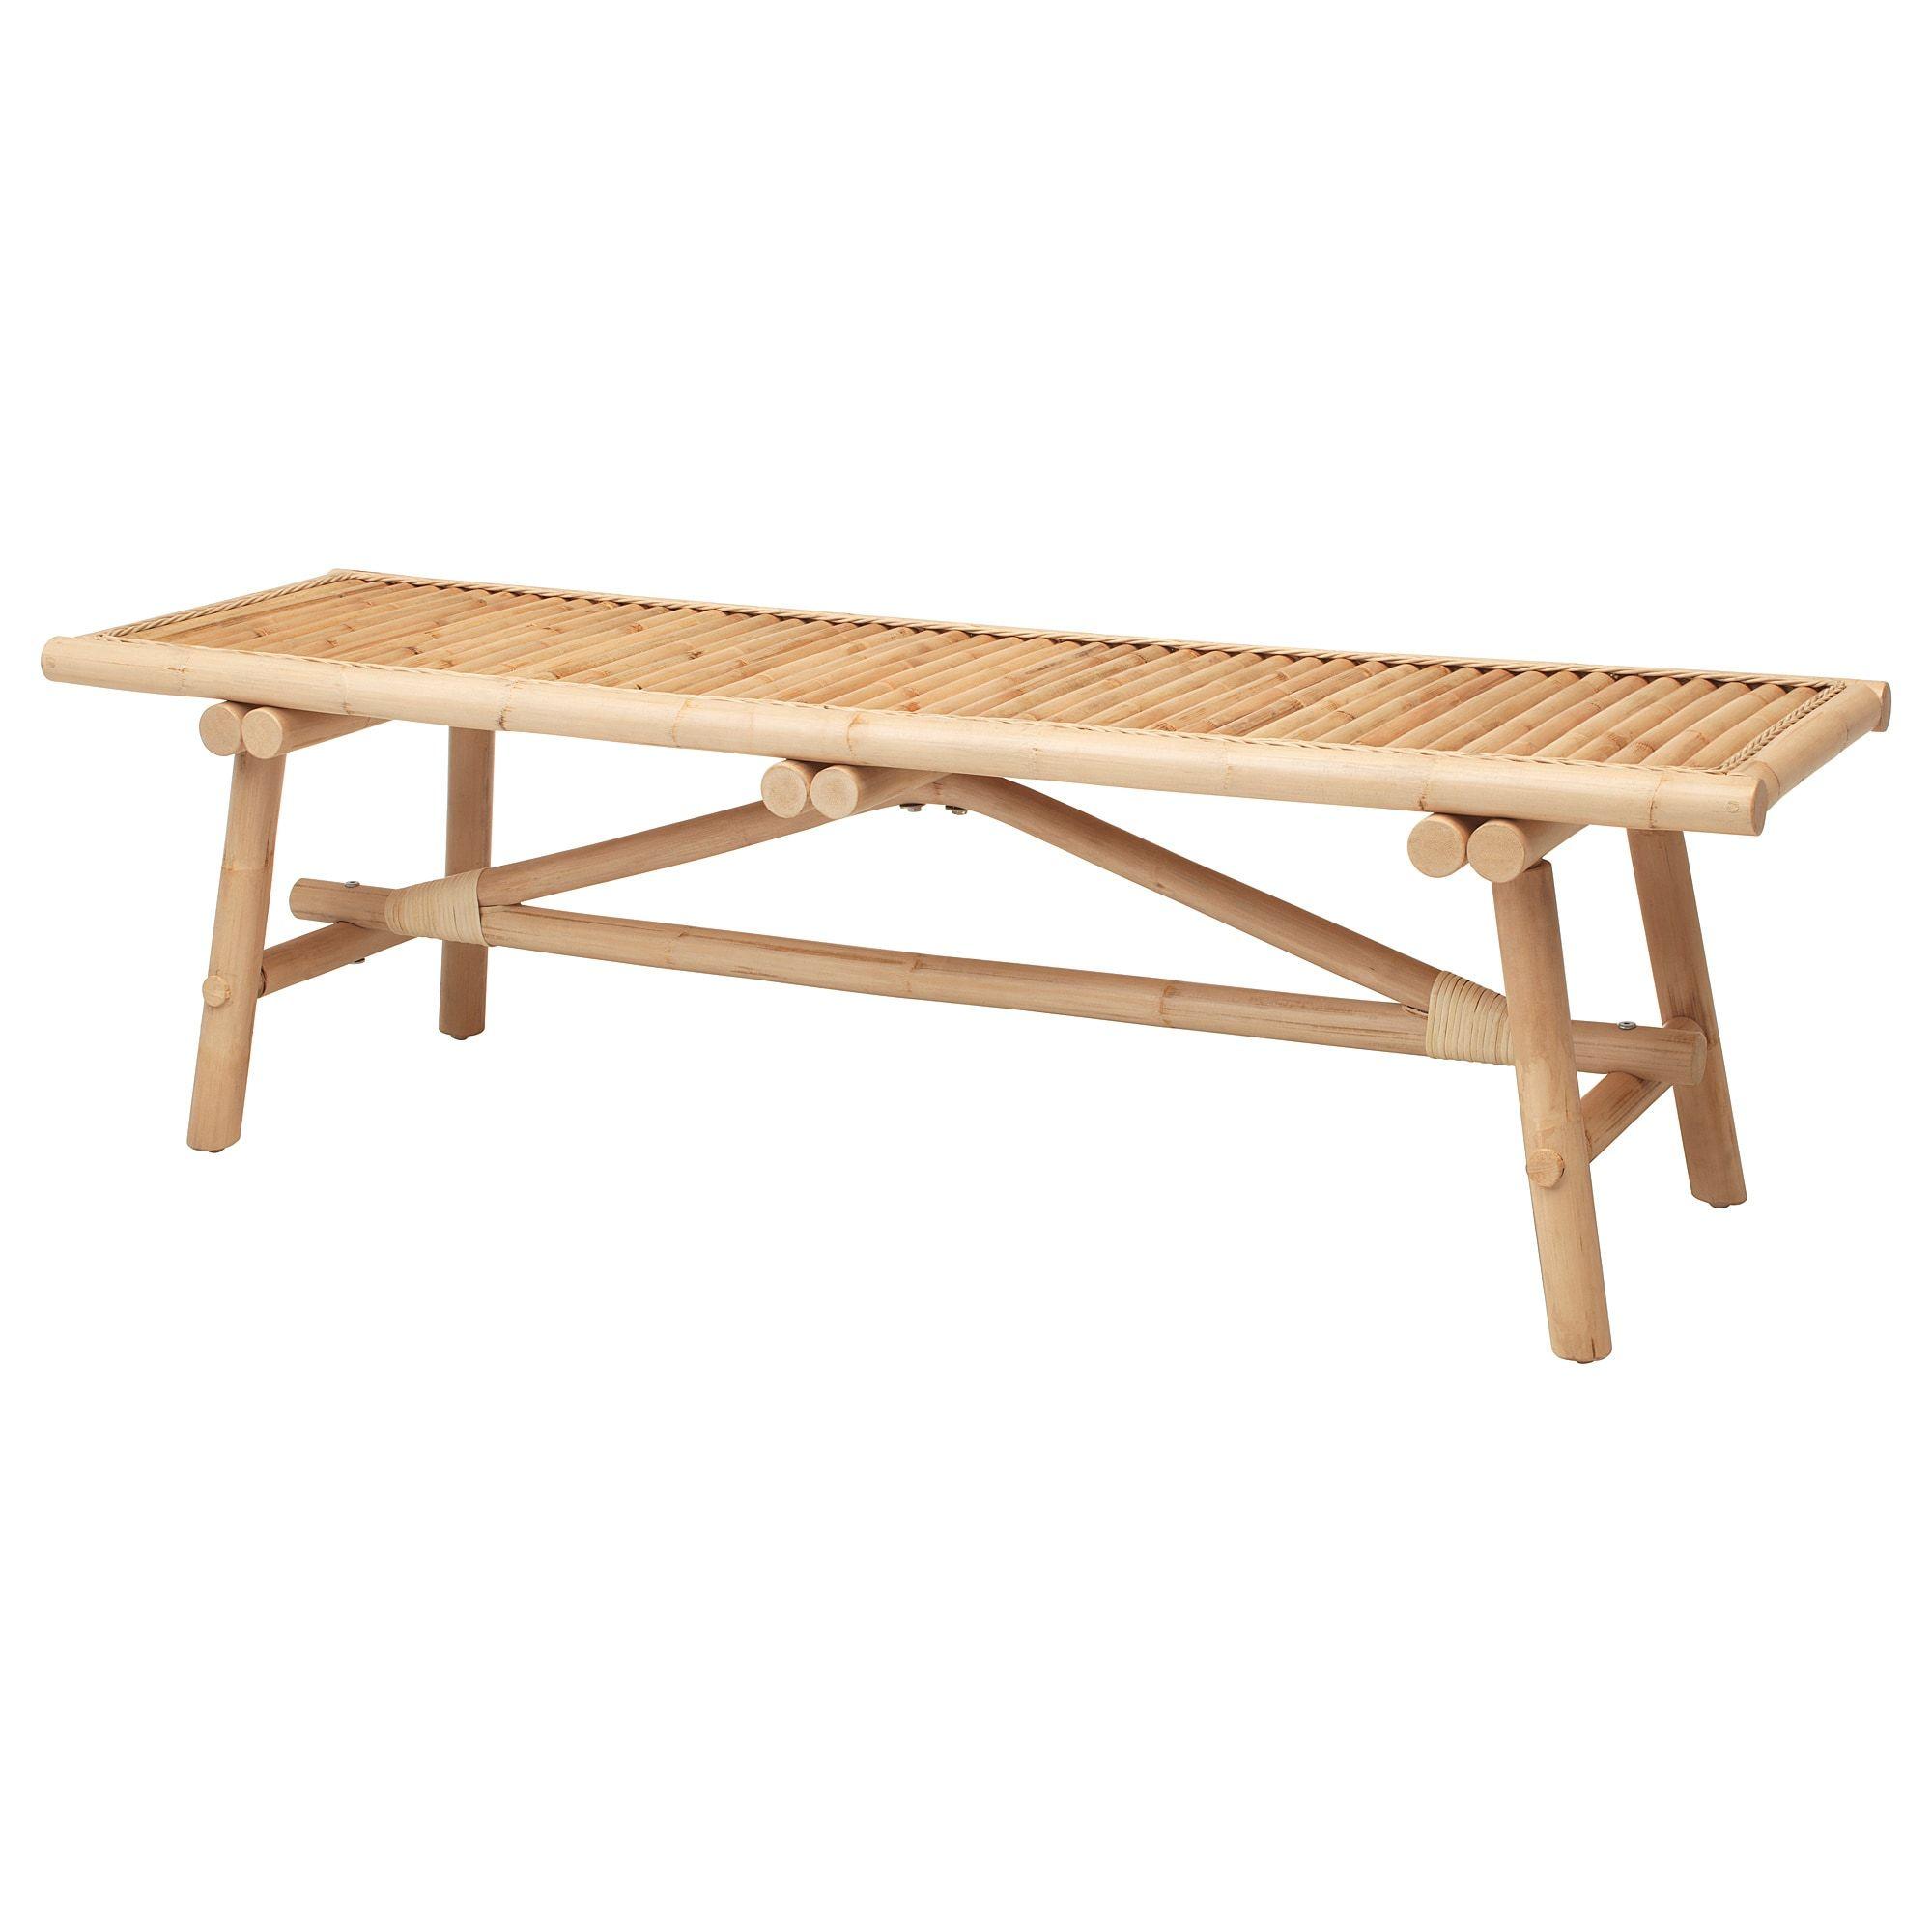 Surprising Bank Tankvard In 2019 Ikea Bench Ikea Furniture Creativecarmelina Interior Chair Design Creativecarmelinacom